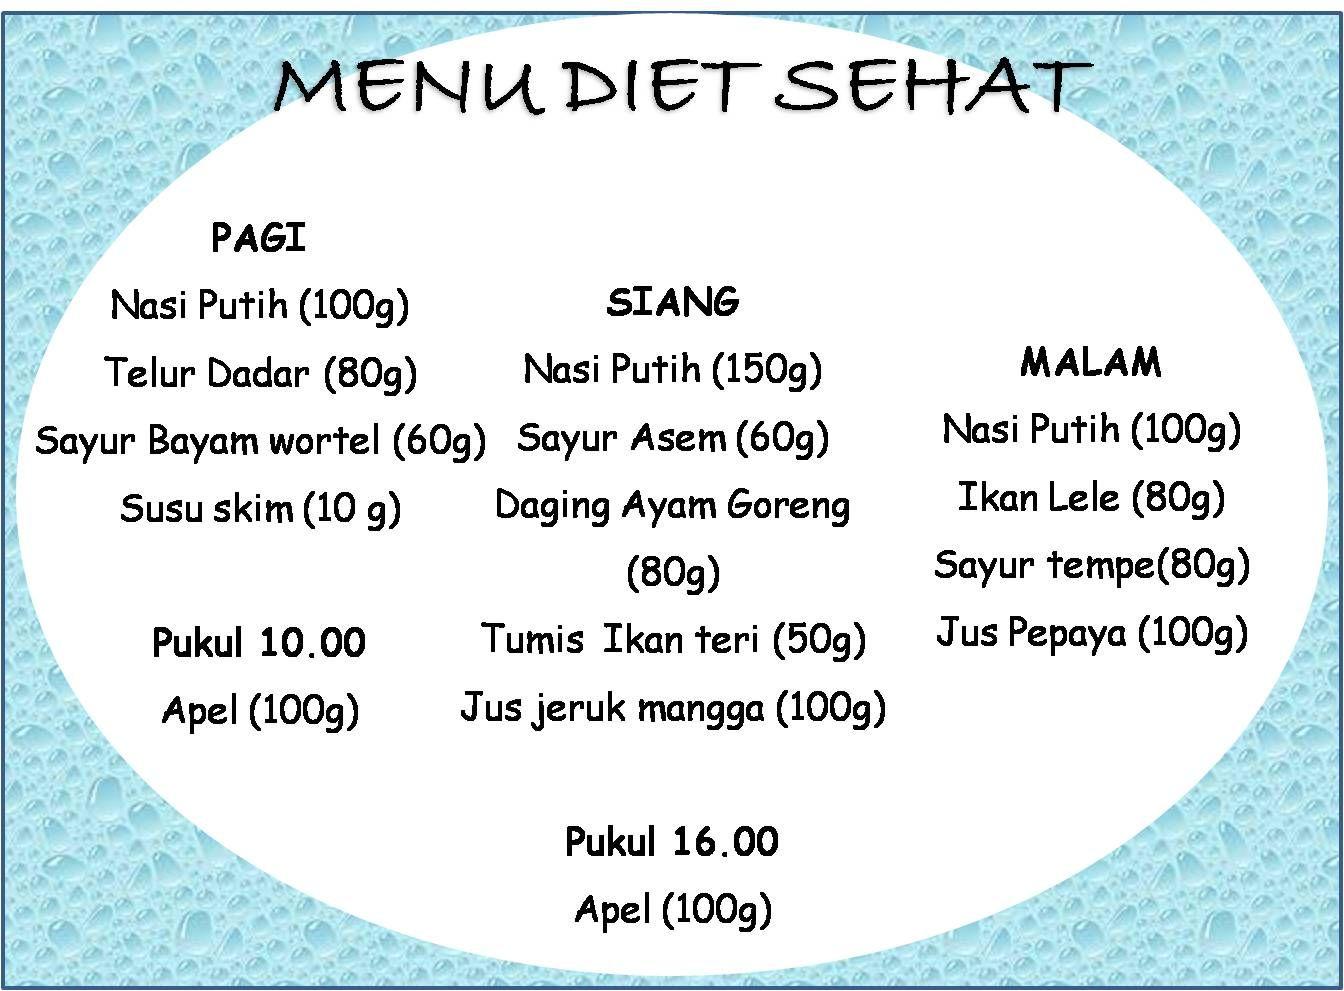 12oo Calorie Diet Plan 1200 Calorie Diet Plan North Indian